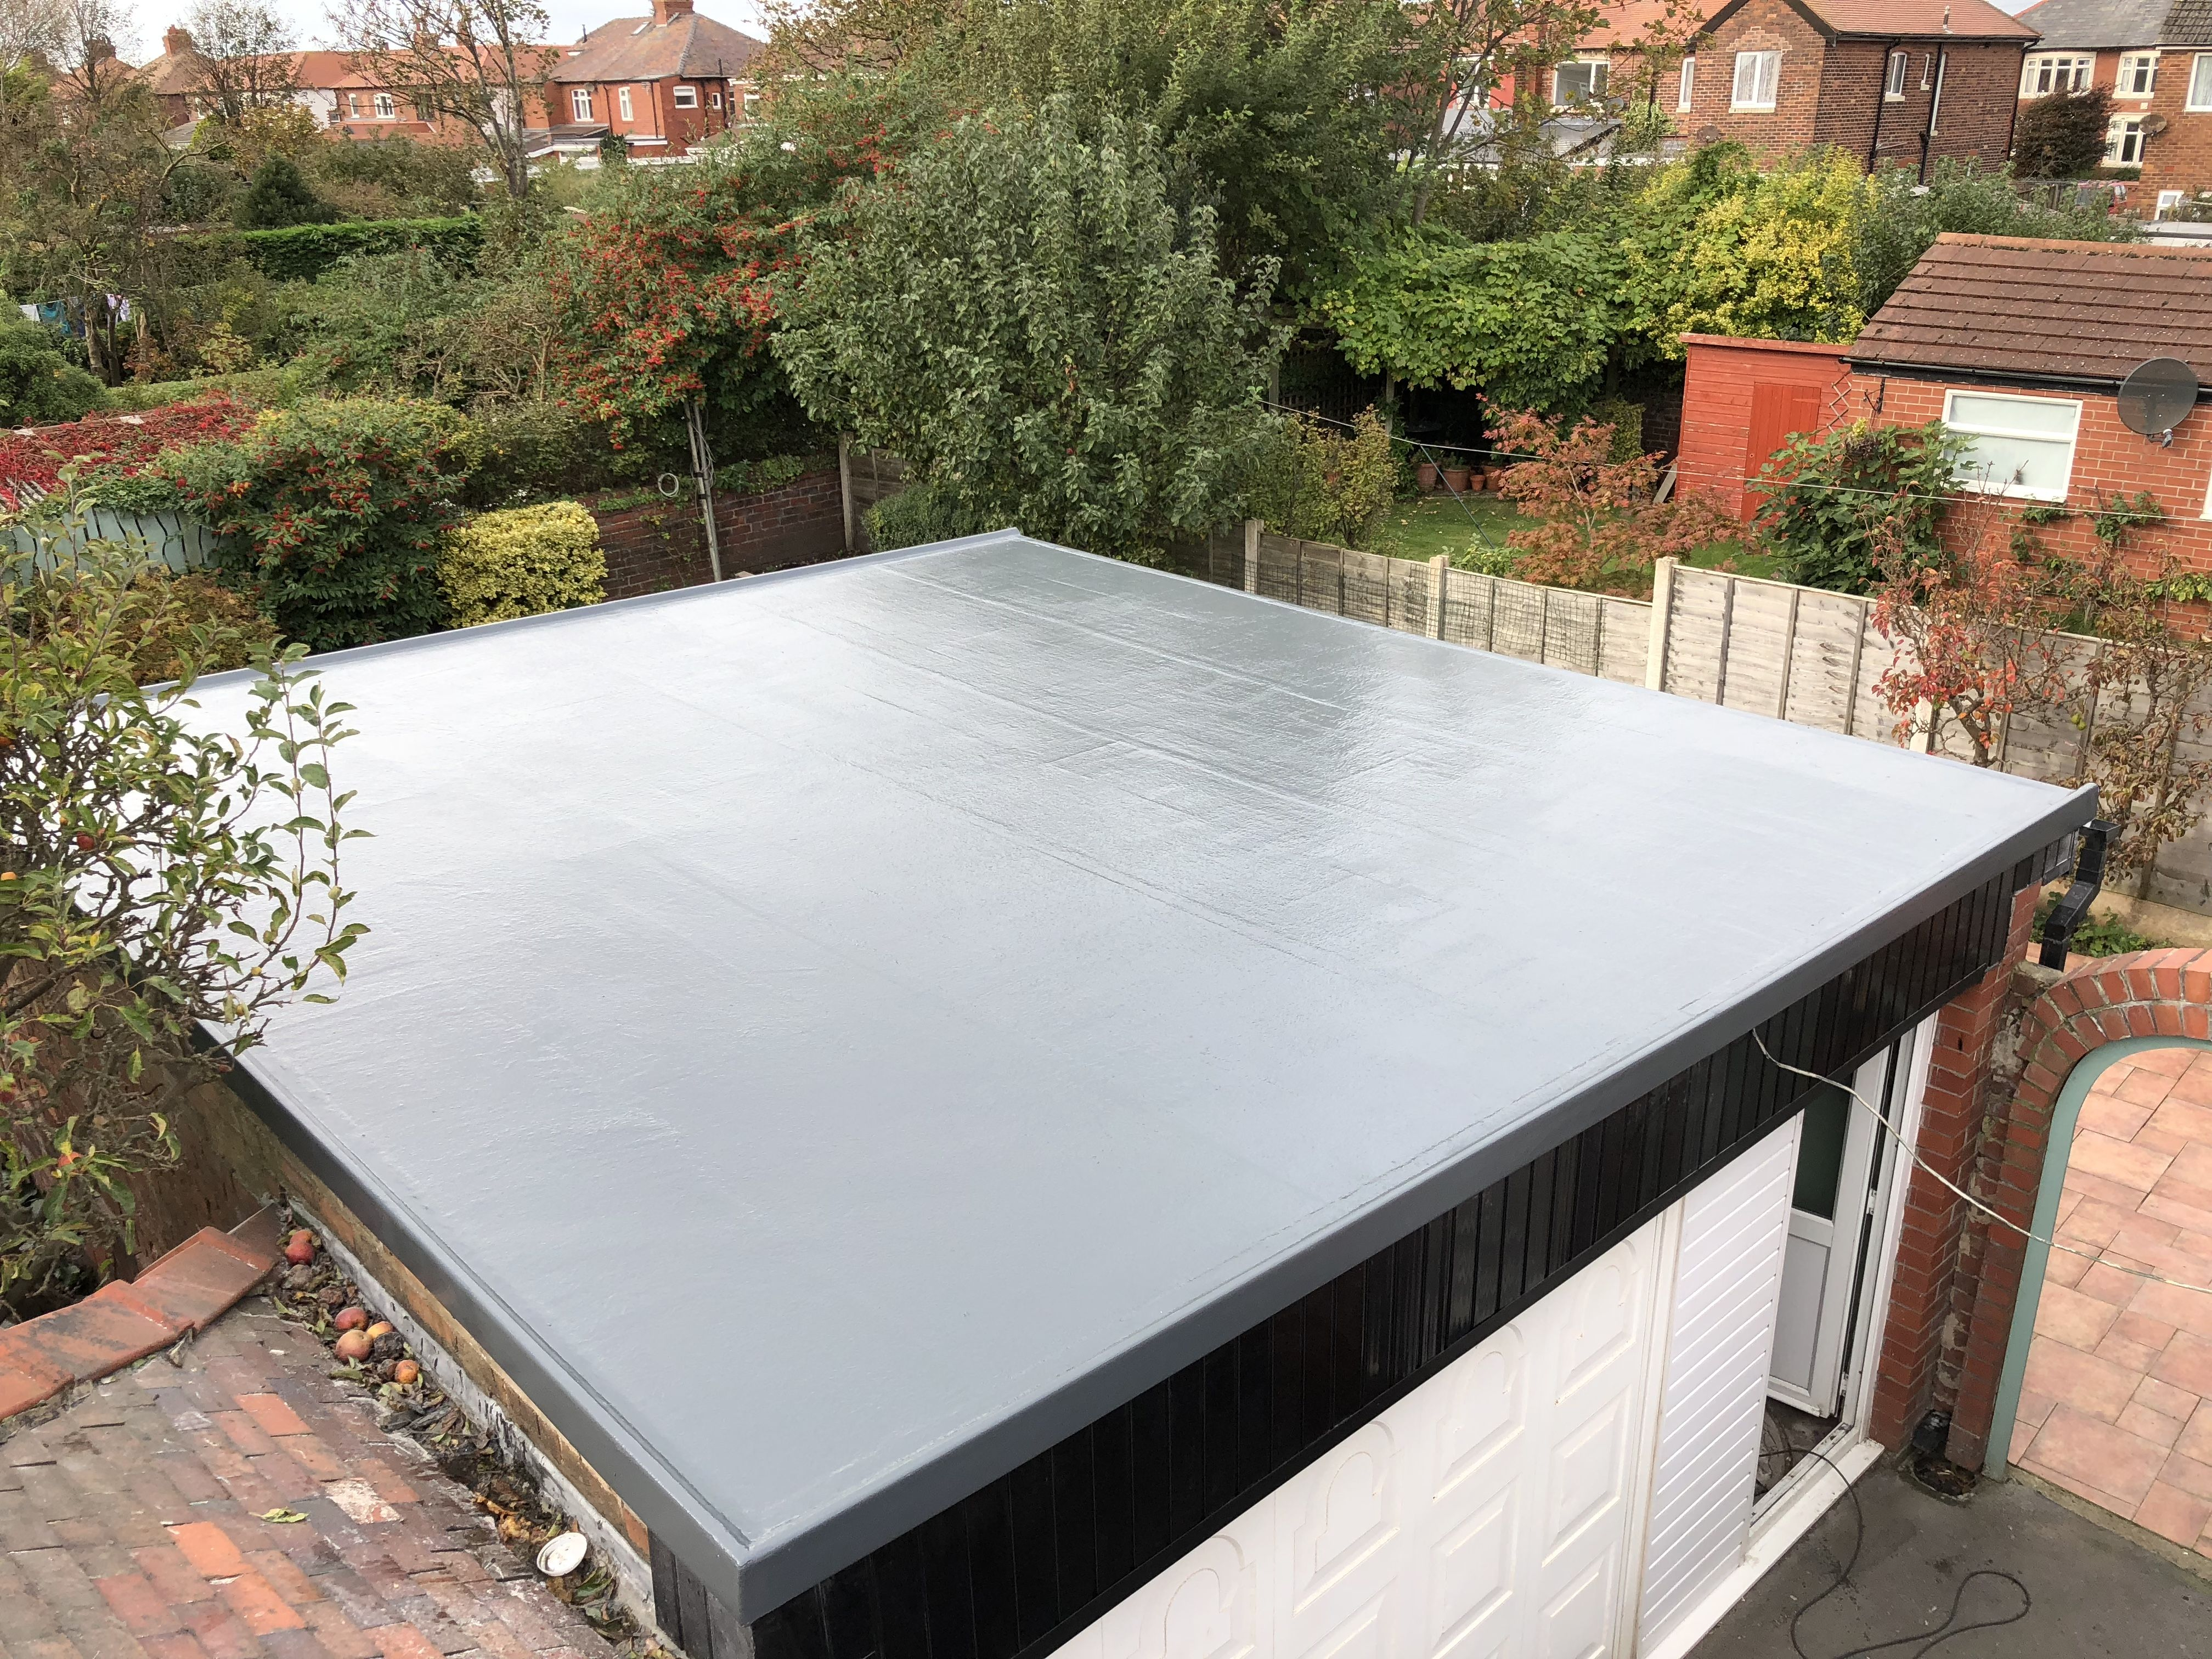 Freestanding Garage Roof In Fibreglass Grp Fibreglass Roof Roof Patio